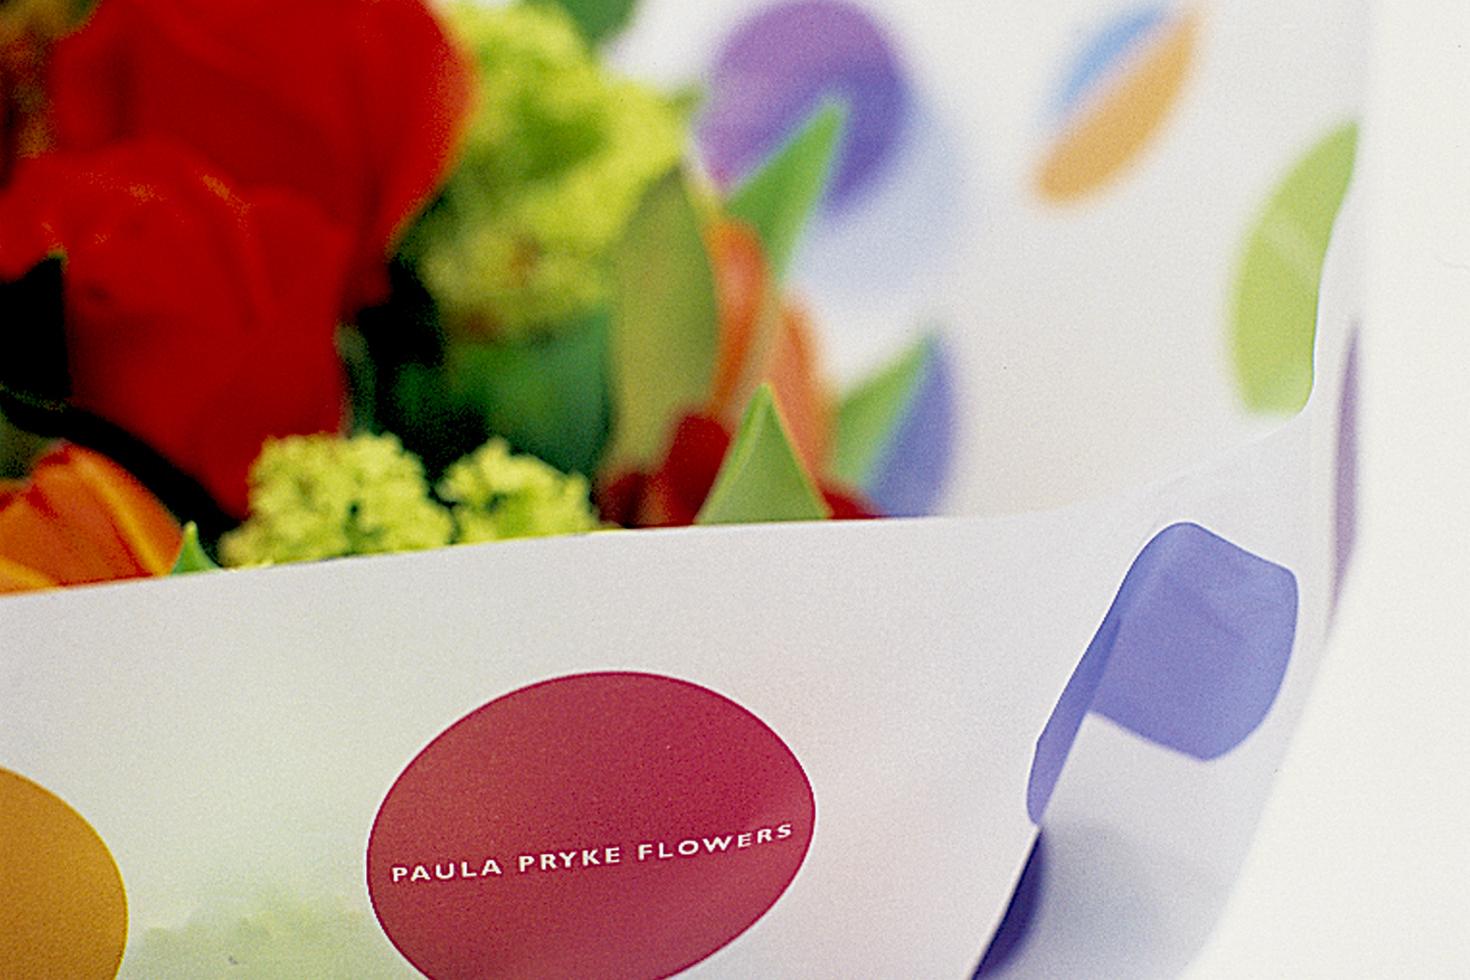 Paula Pryke Flowers wrapping